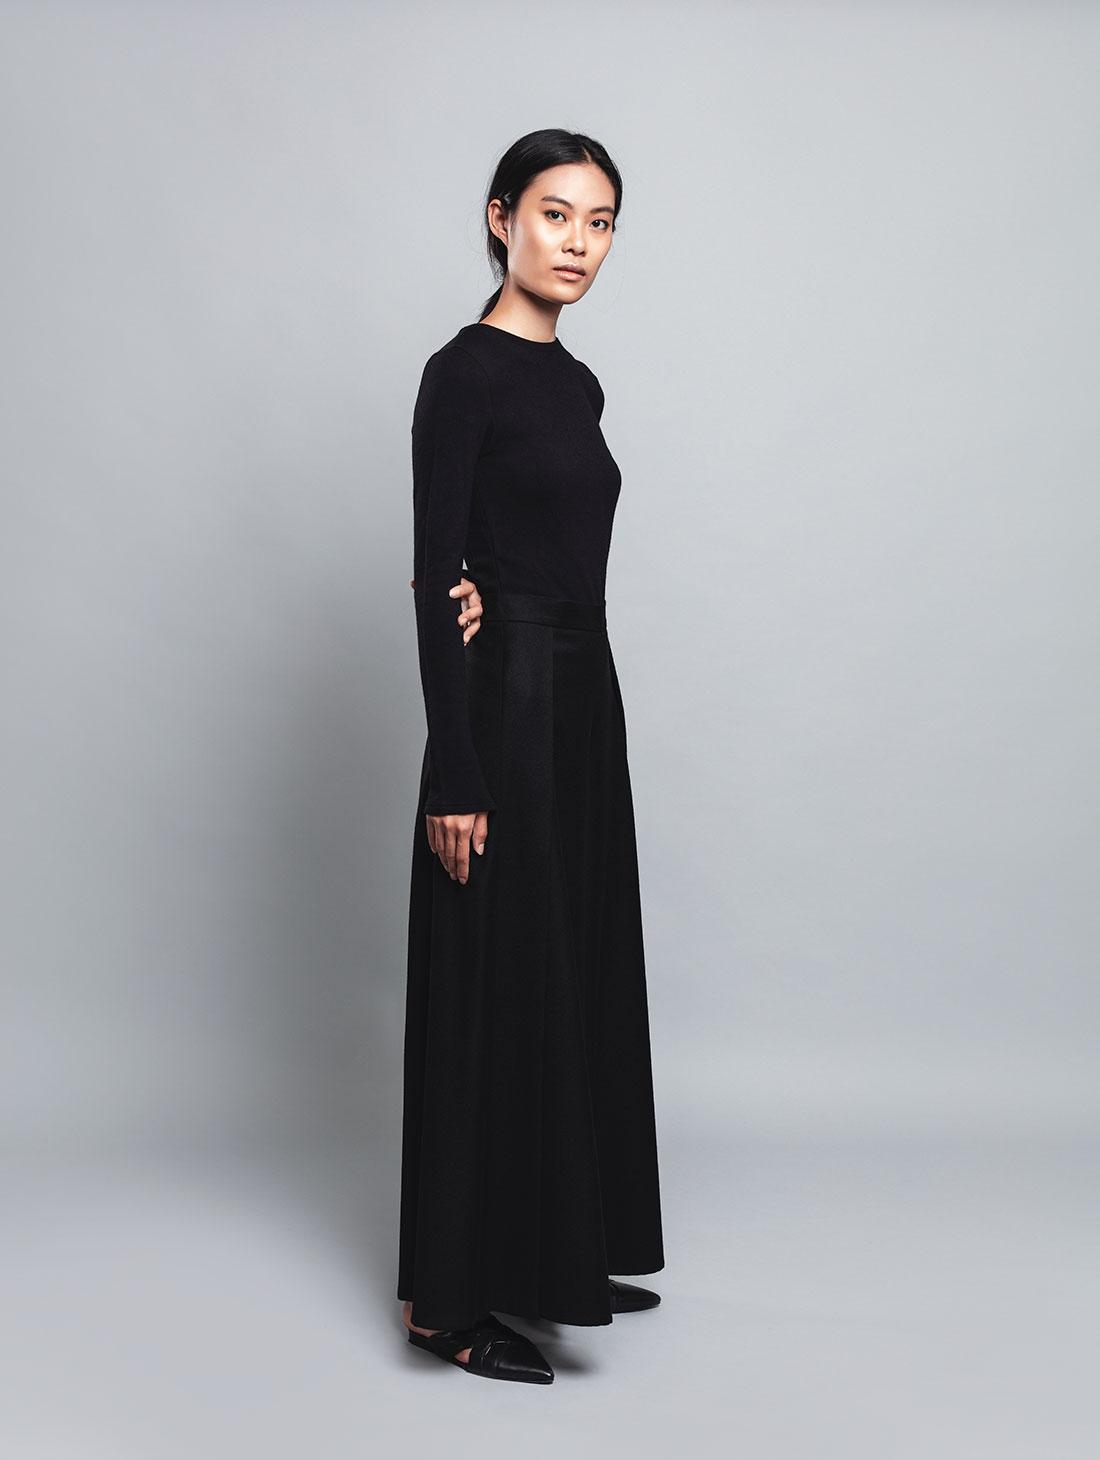 Kalgan – Pantalone Nero, Vita Alta, 100% Lana